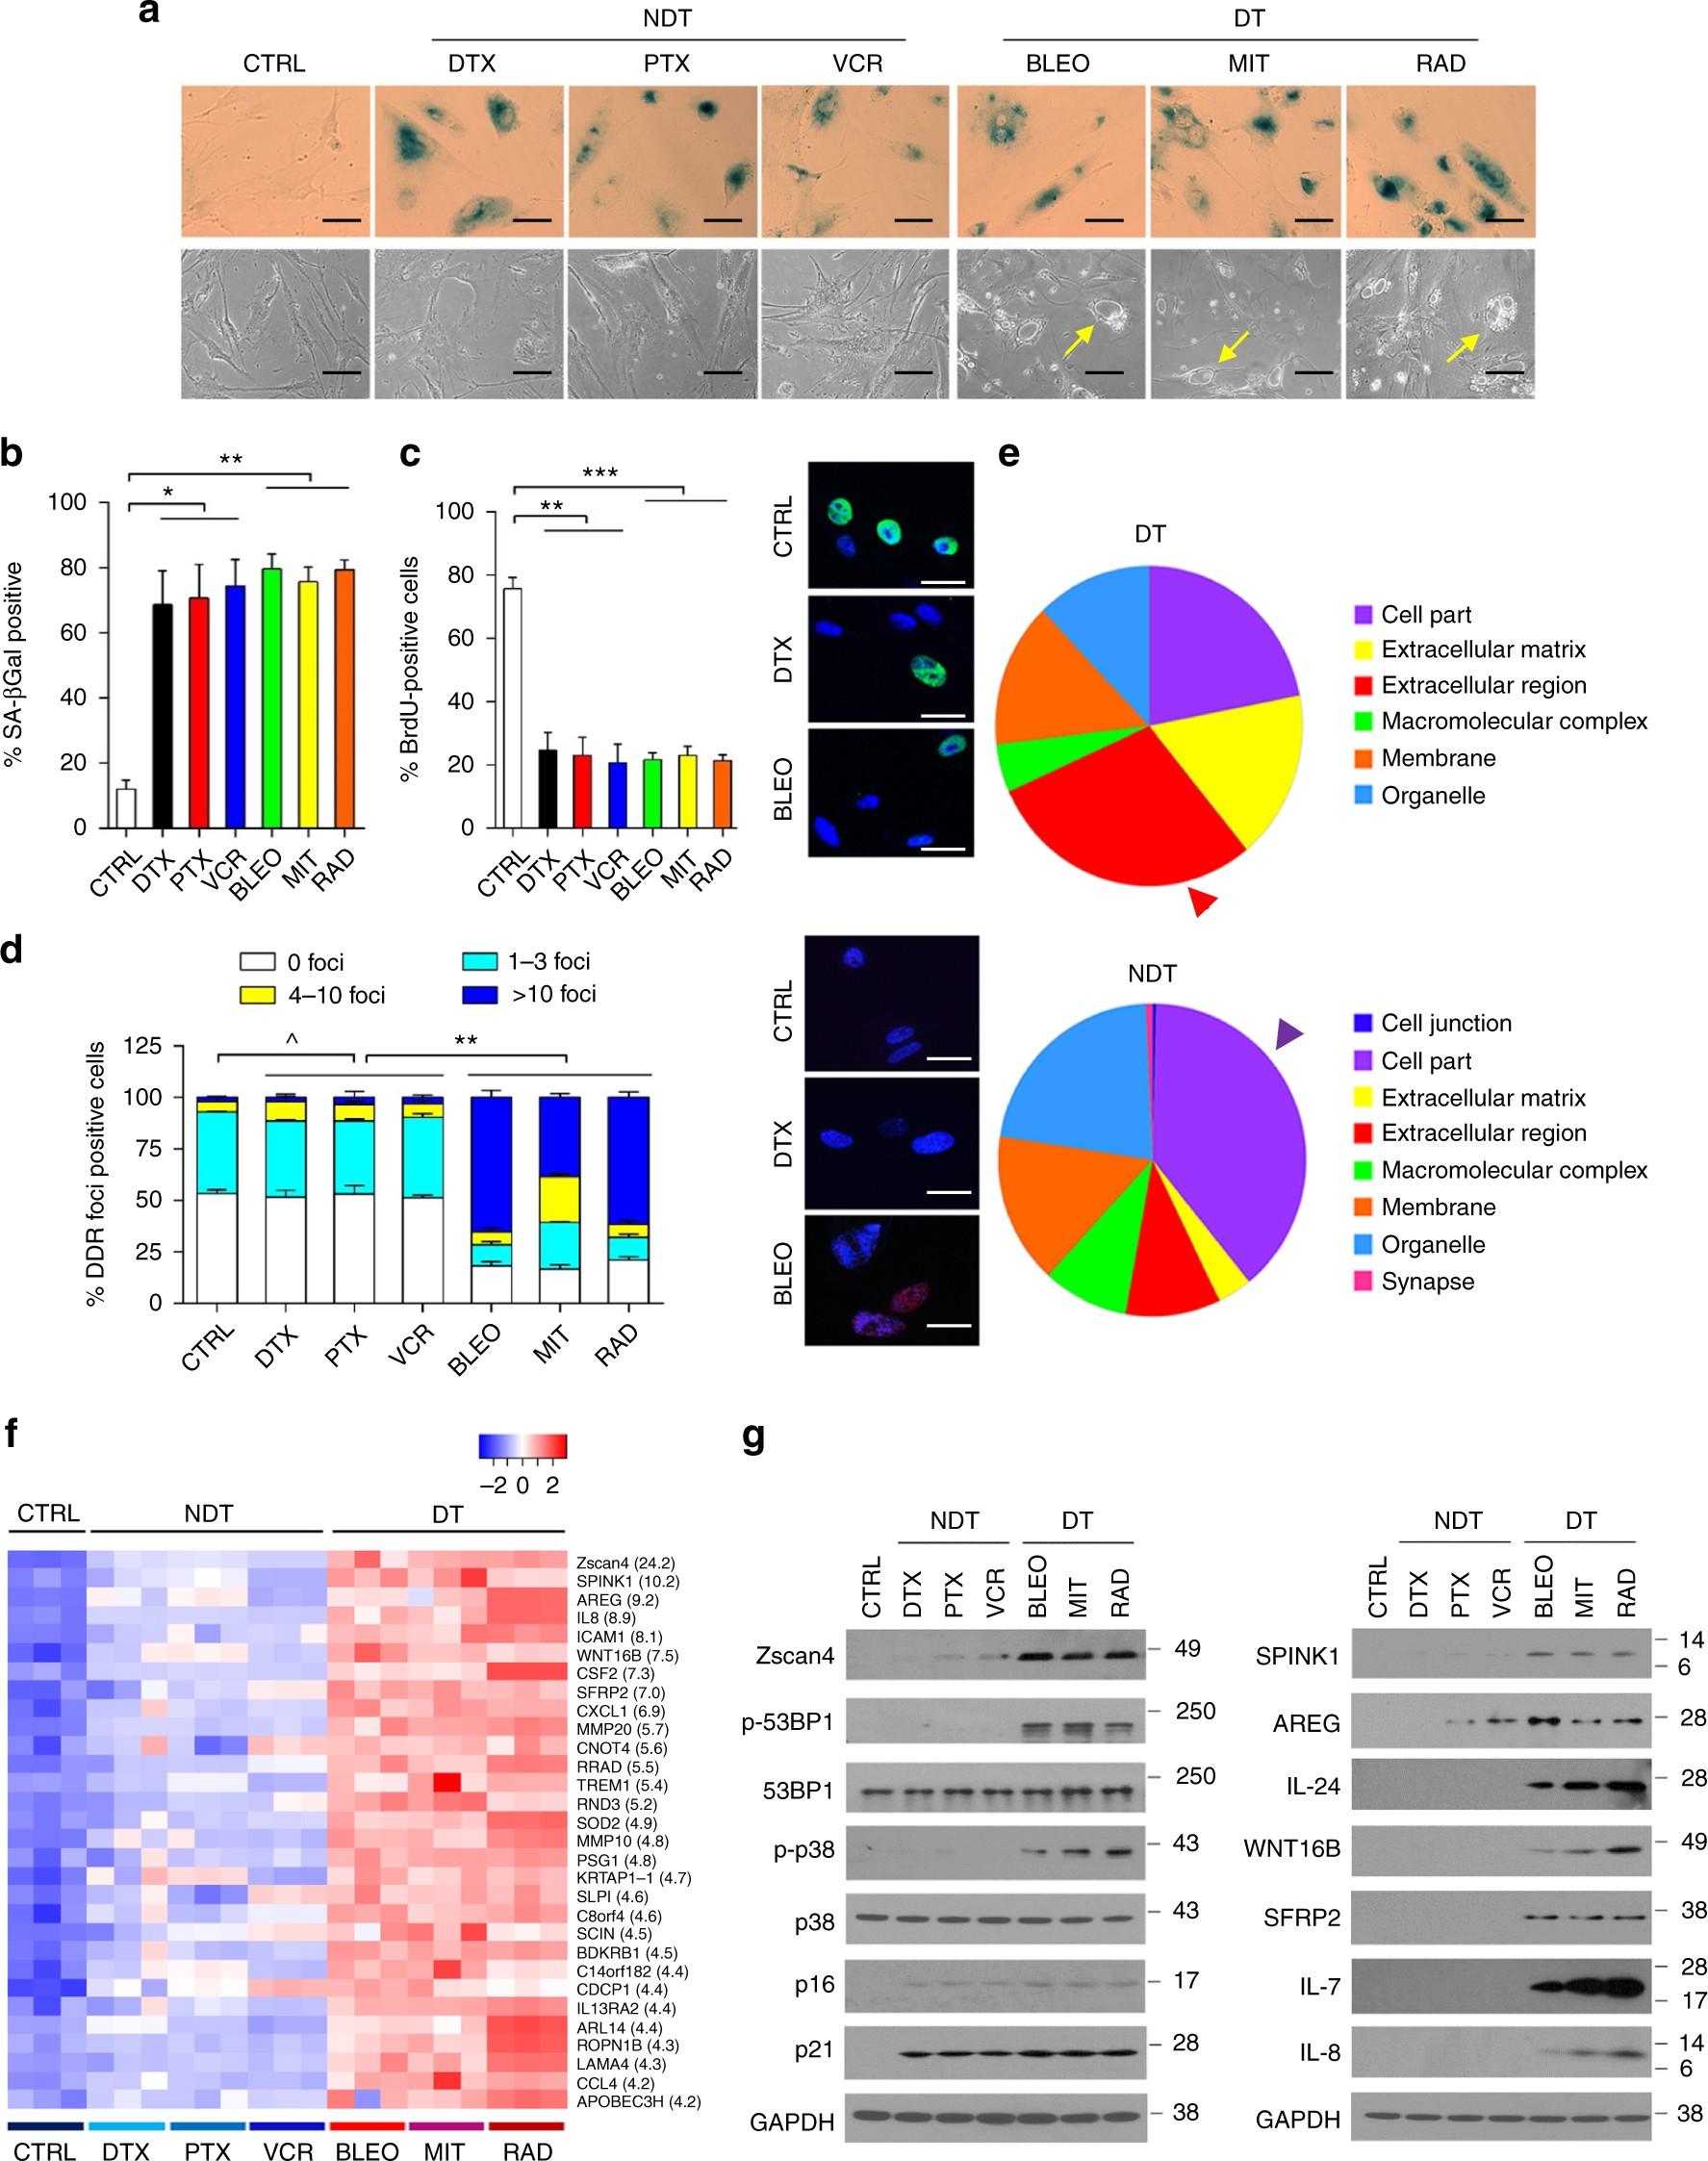 Ana Paula Fernández Santacruz Ruiz the senescence-associated secretory phenotype is potentiated